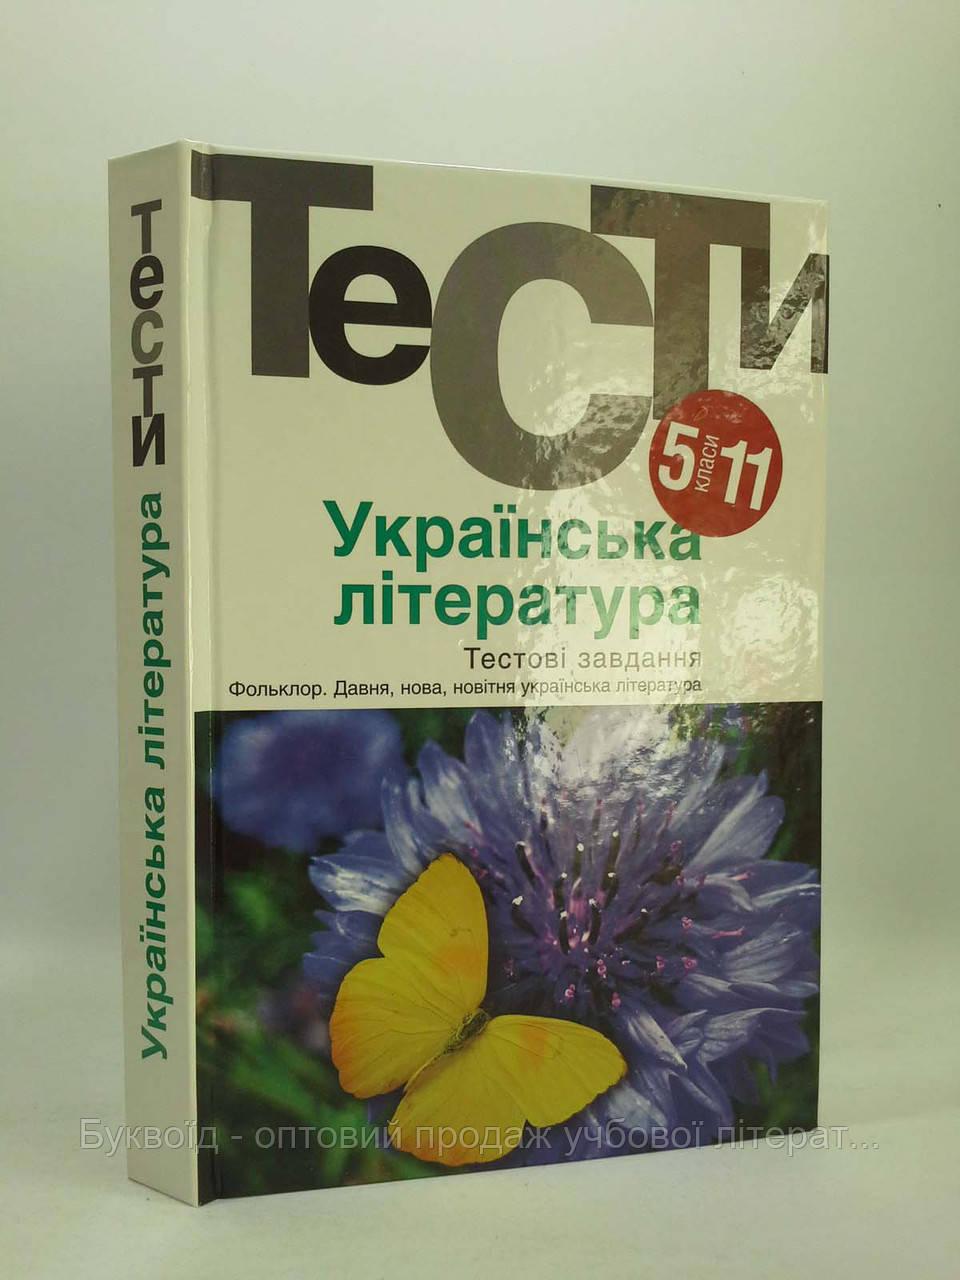 Тести Українська література 5 11 класи Бернадська Усатенко